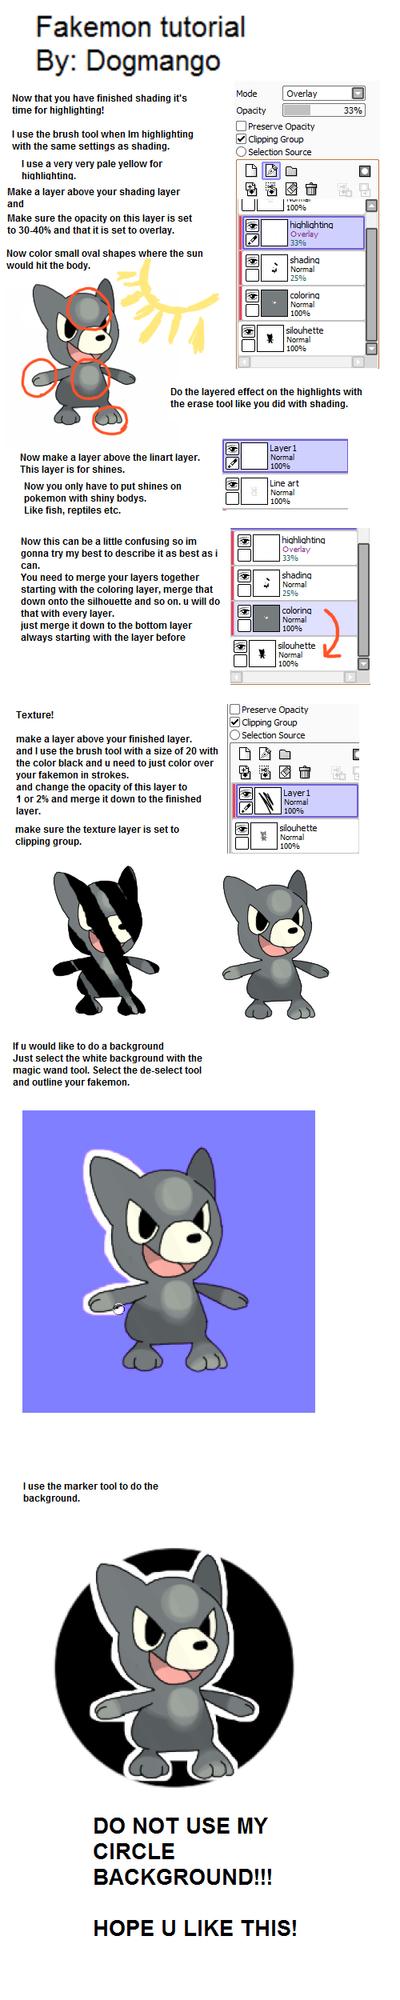 Fakemon Tutorial Part 2 by DogMango